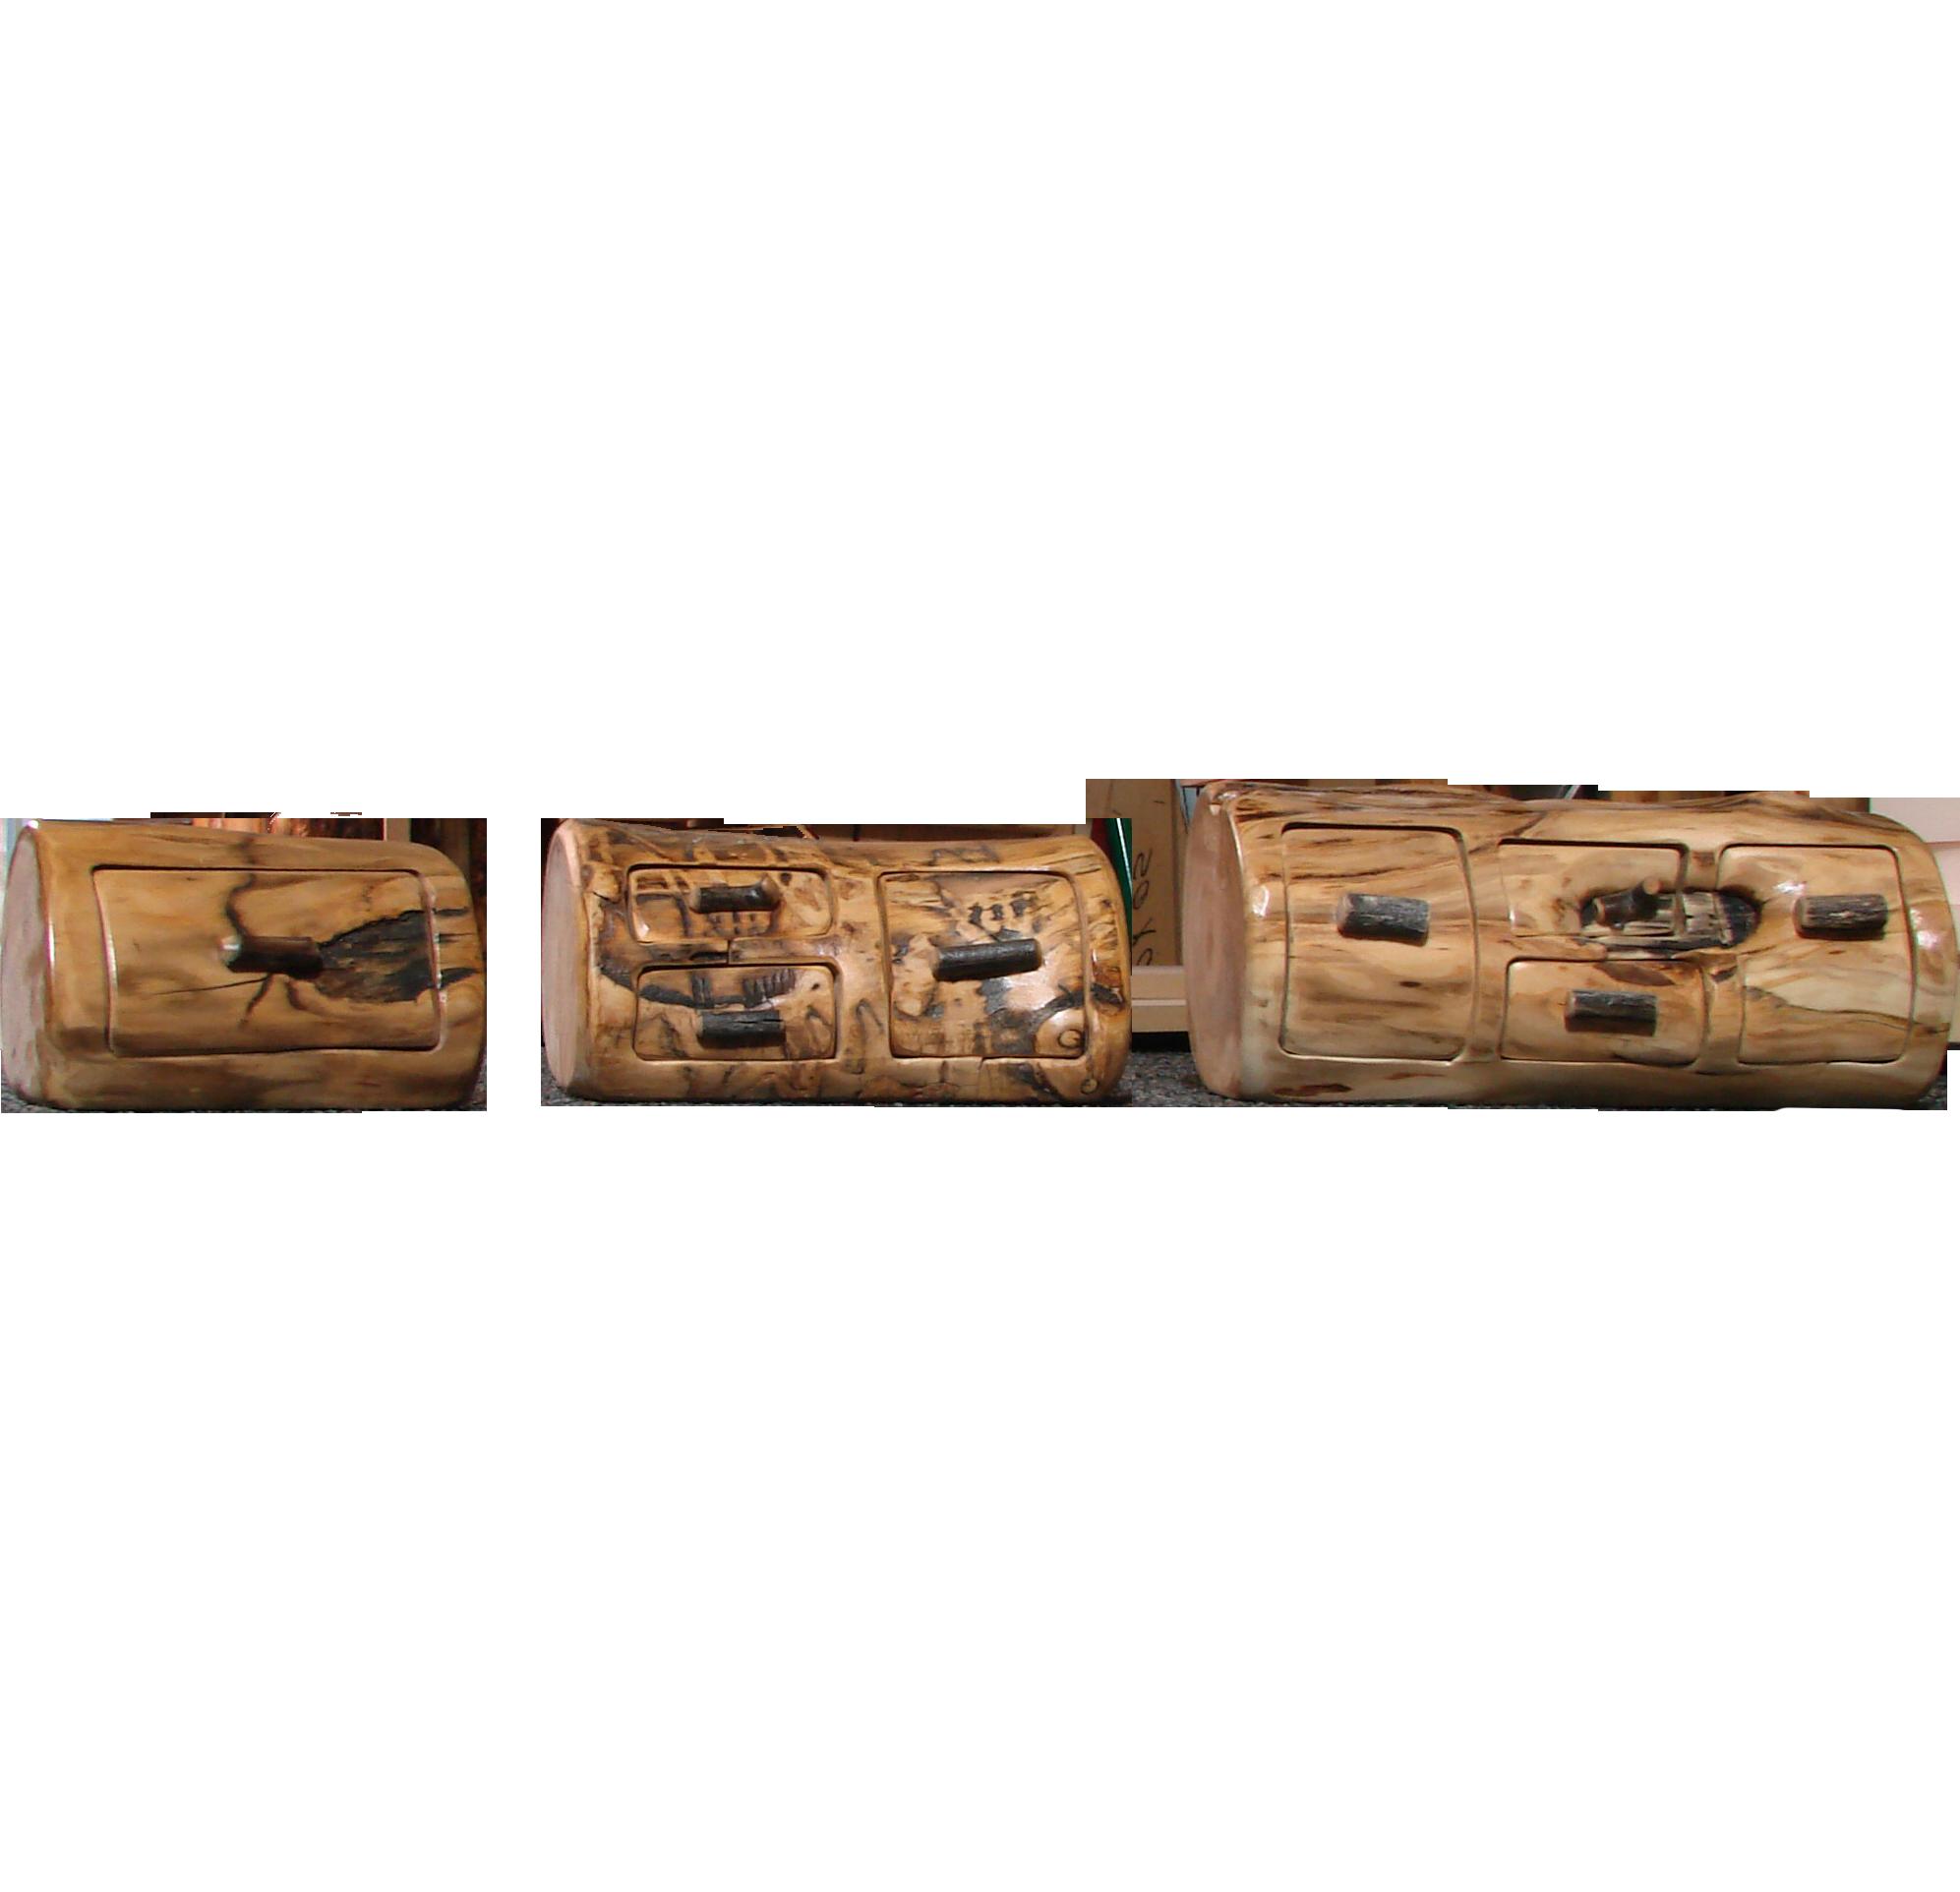 Jewelry cabinet rustic log furniture of utah for Hidden jewelry drawer